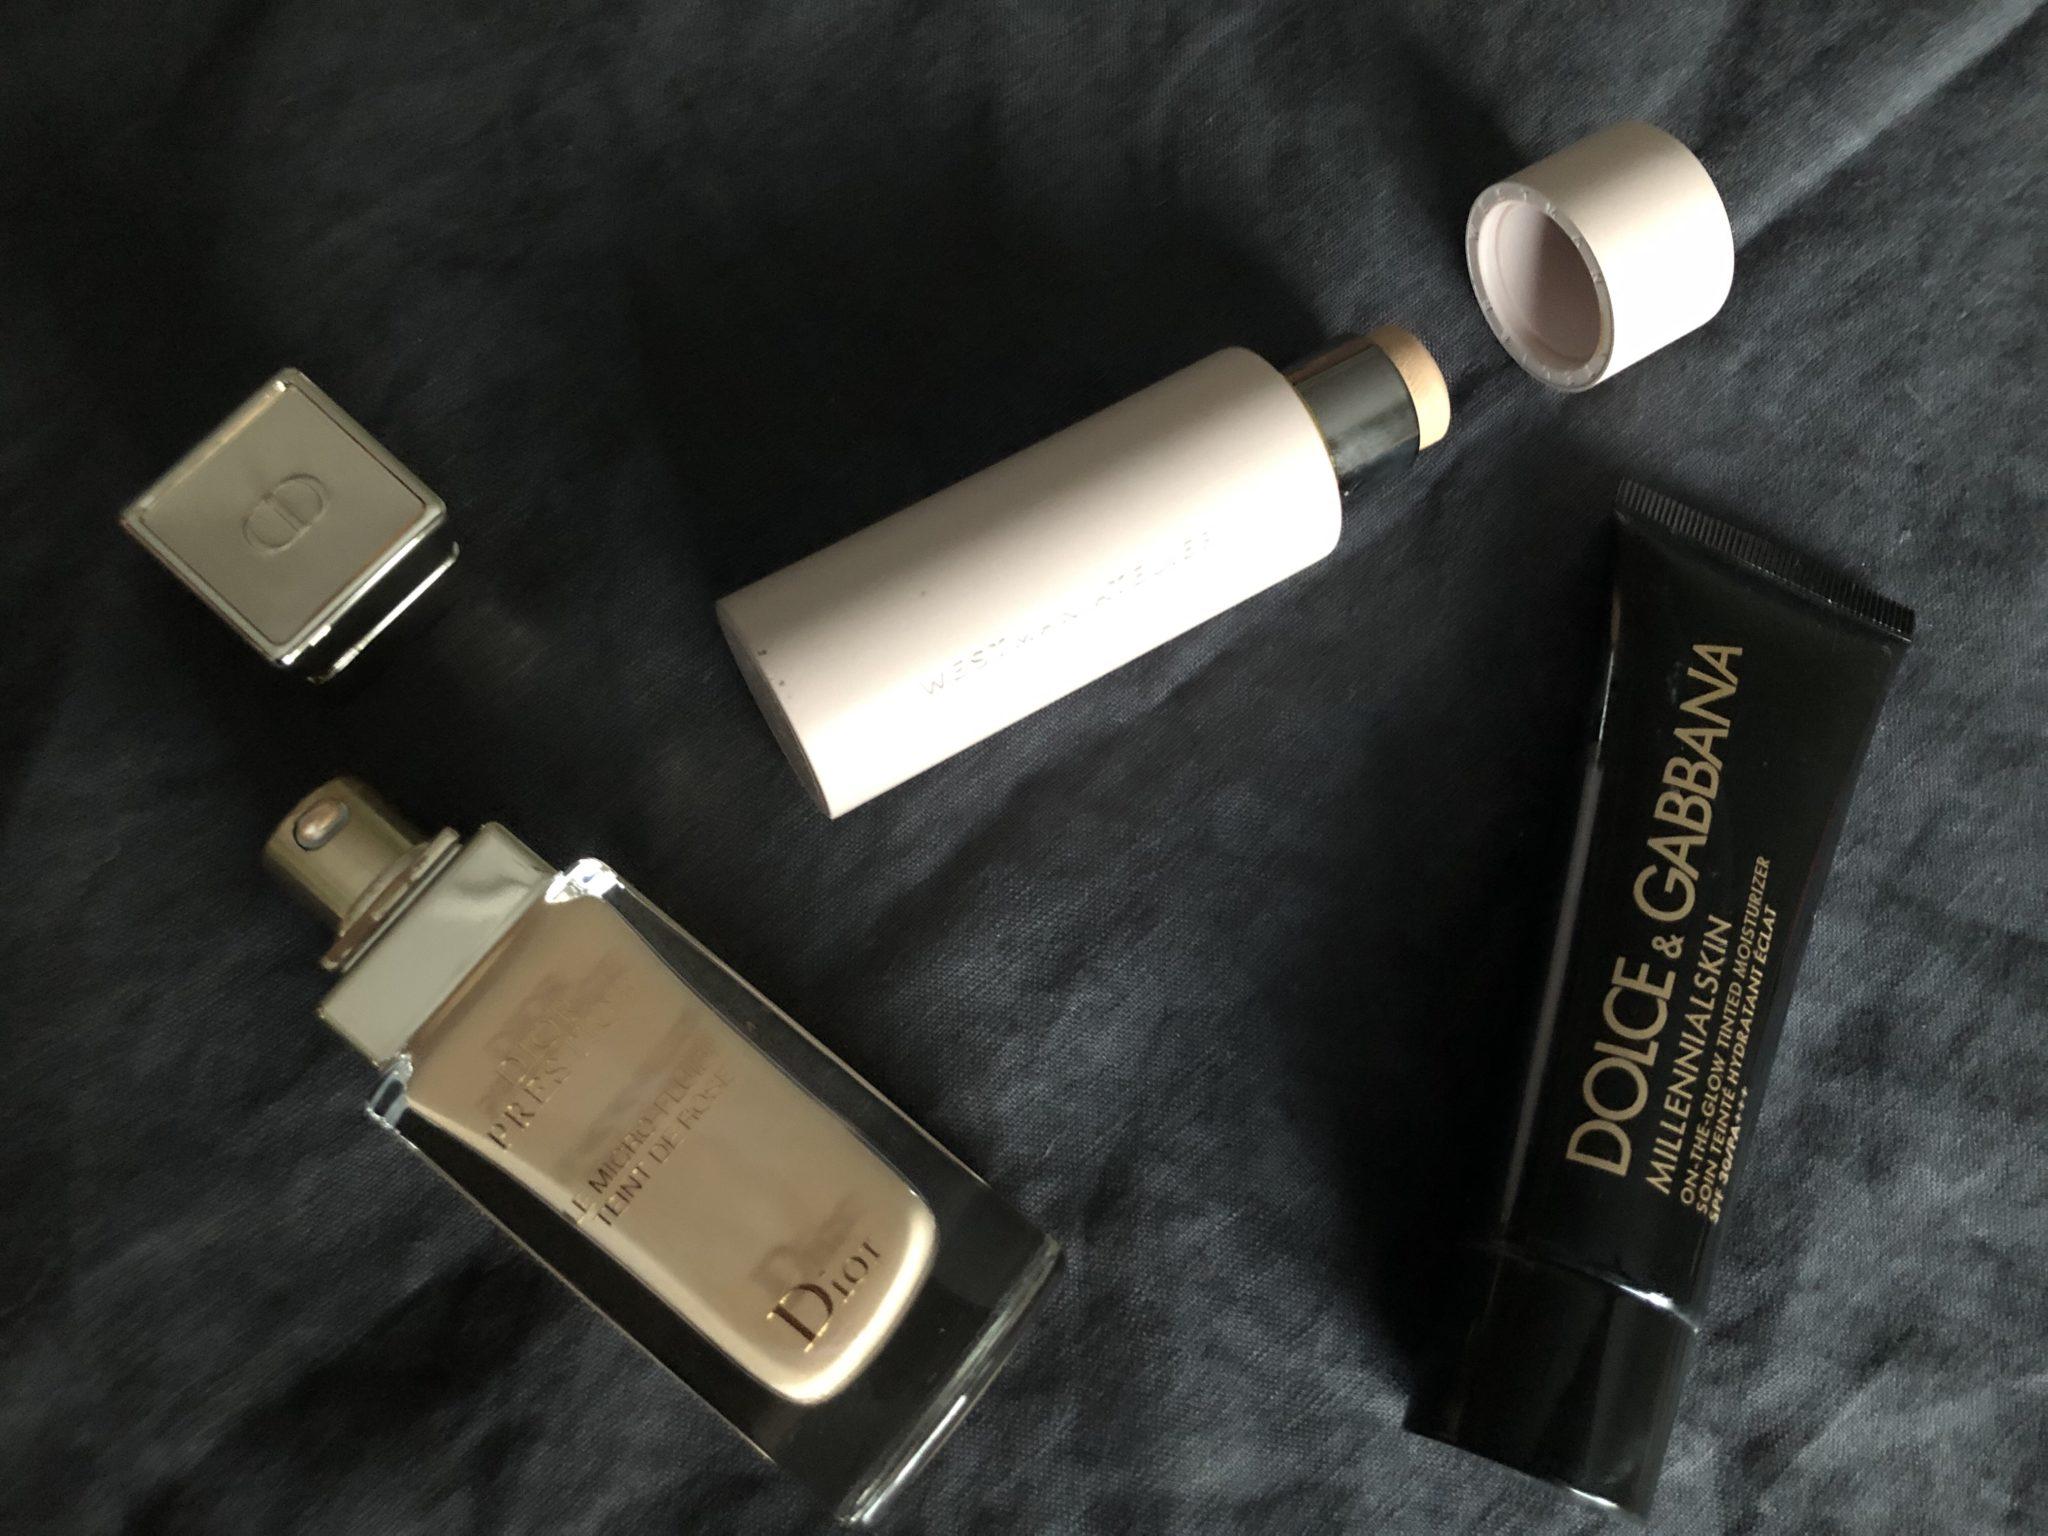 Bilden visar de tre foundations som nämns i texten: Westman Atelier Vital Skin Foundation Stick,Dolce & Gabbana Millennial Skin On-the Glow Tinted Moisturizer och Dior Prestige Le Micro-Fluide Teint de Rose Foundation.